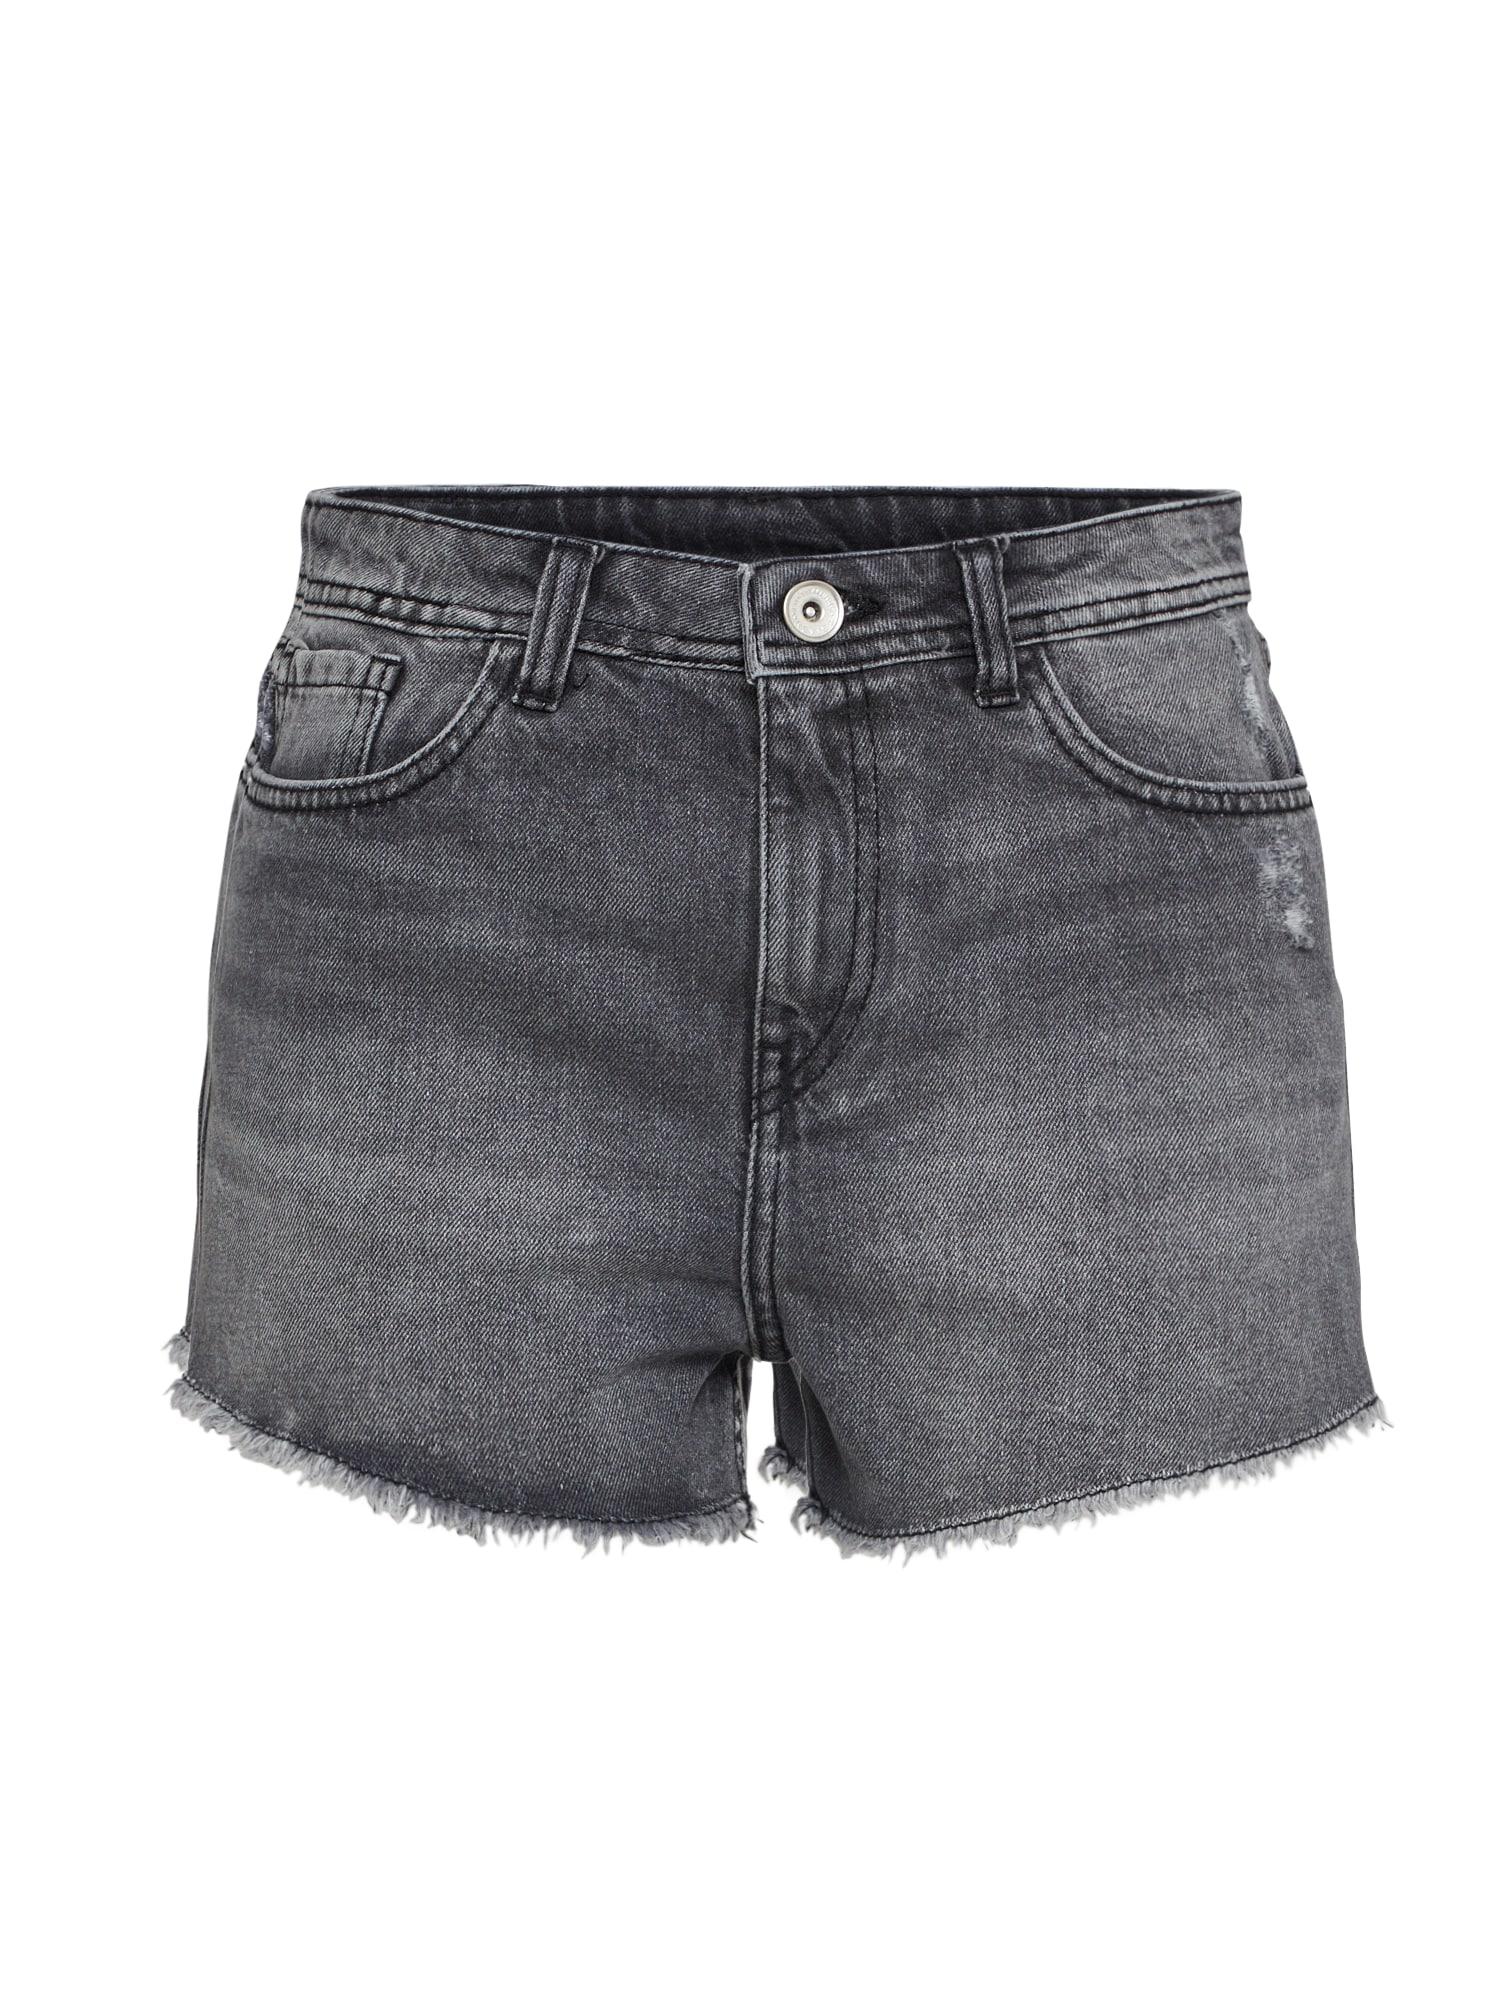 Hot Pants | Bekleidung > Hosen > Hotpants | Review